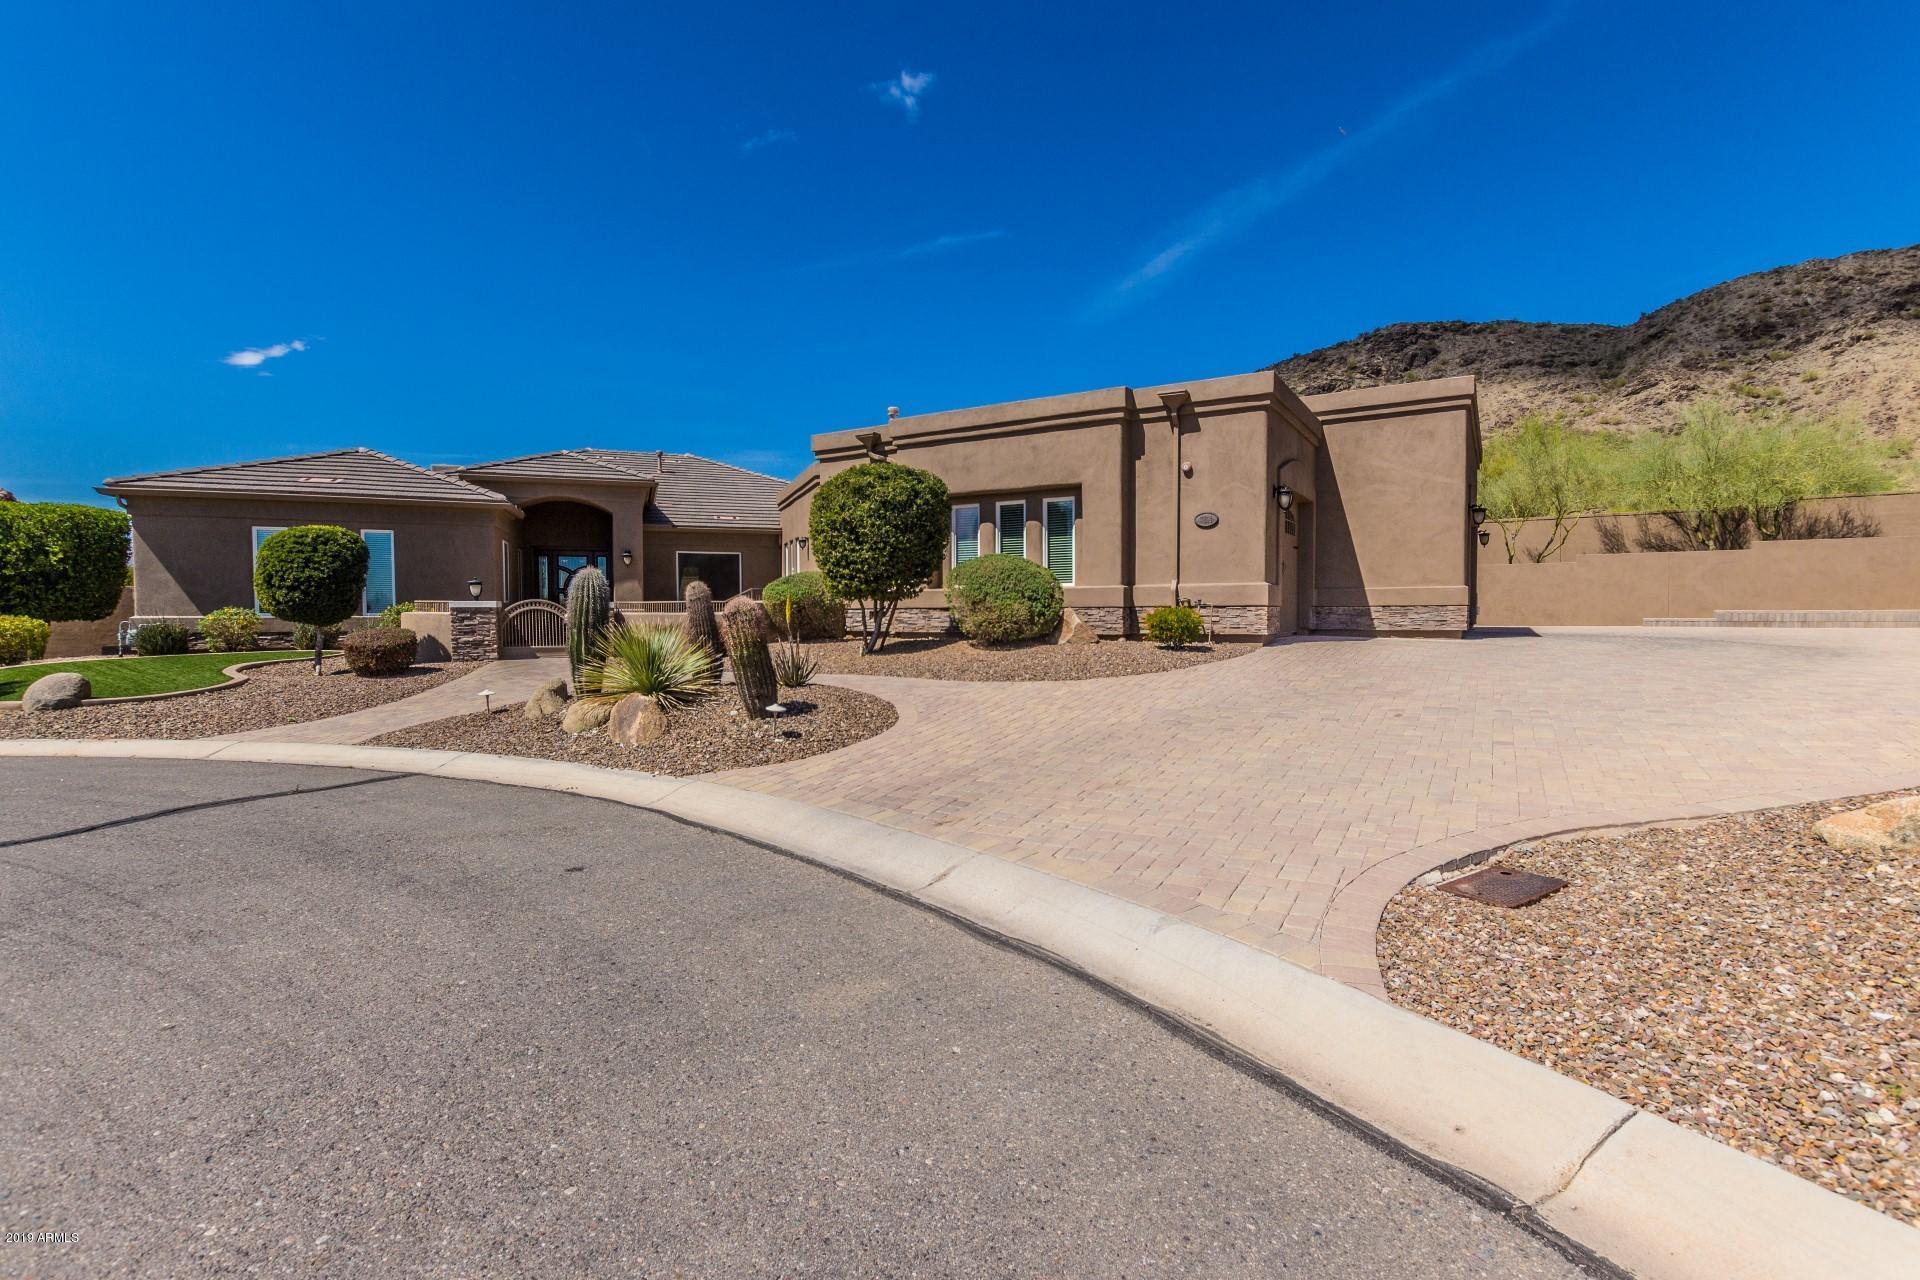 Photo of 3114 W GLENHAVEN Drive, Phoenix, AZ 85045